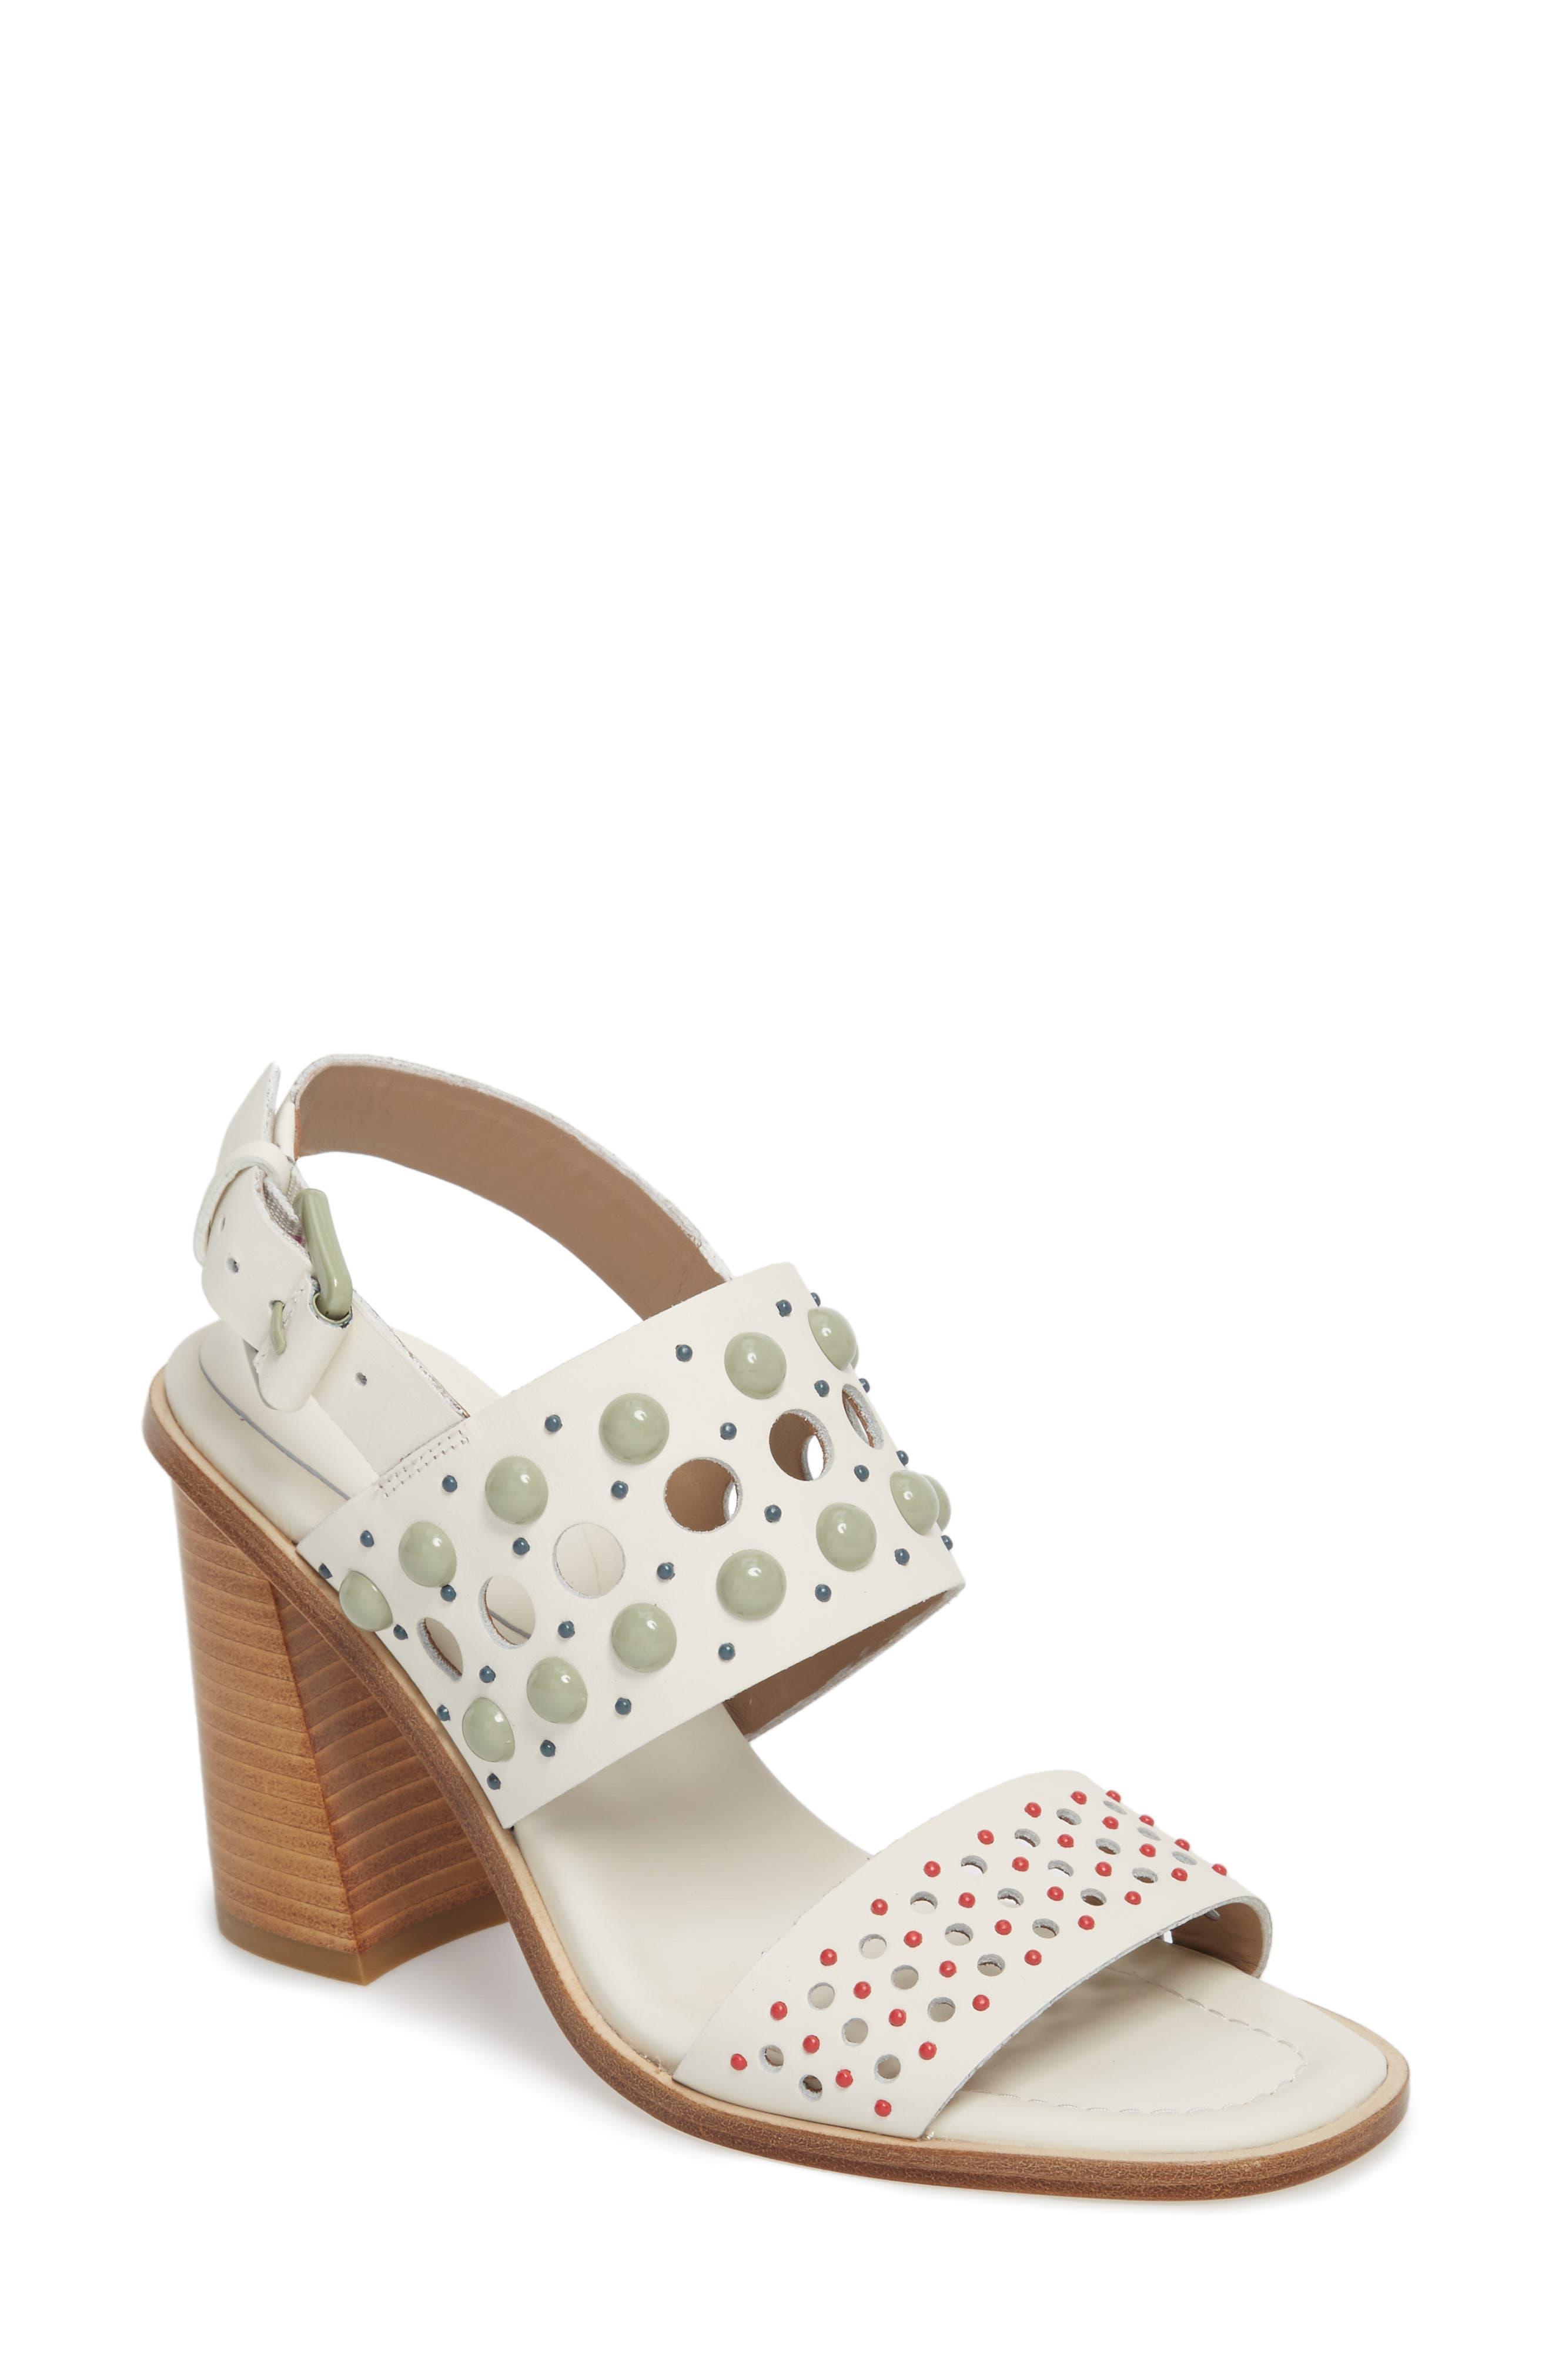 Estee Studded Sandal,                             Main thumbnail 1, color,                             Bone Leather